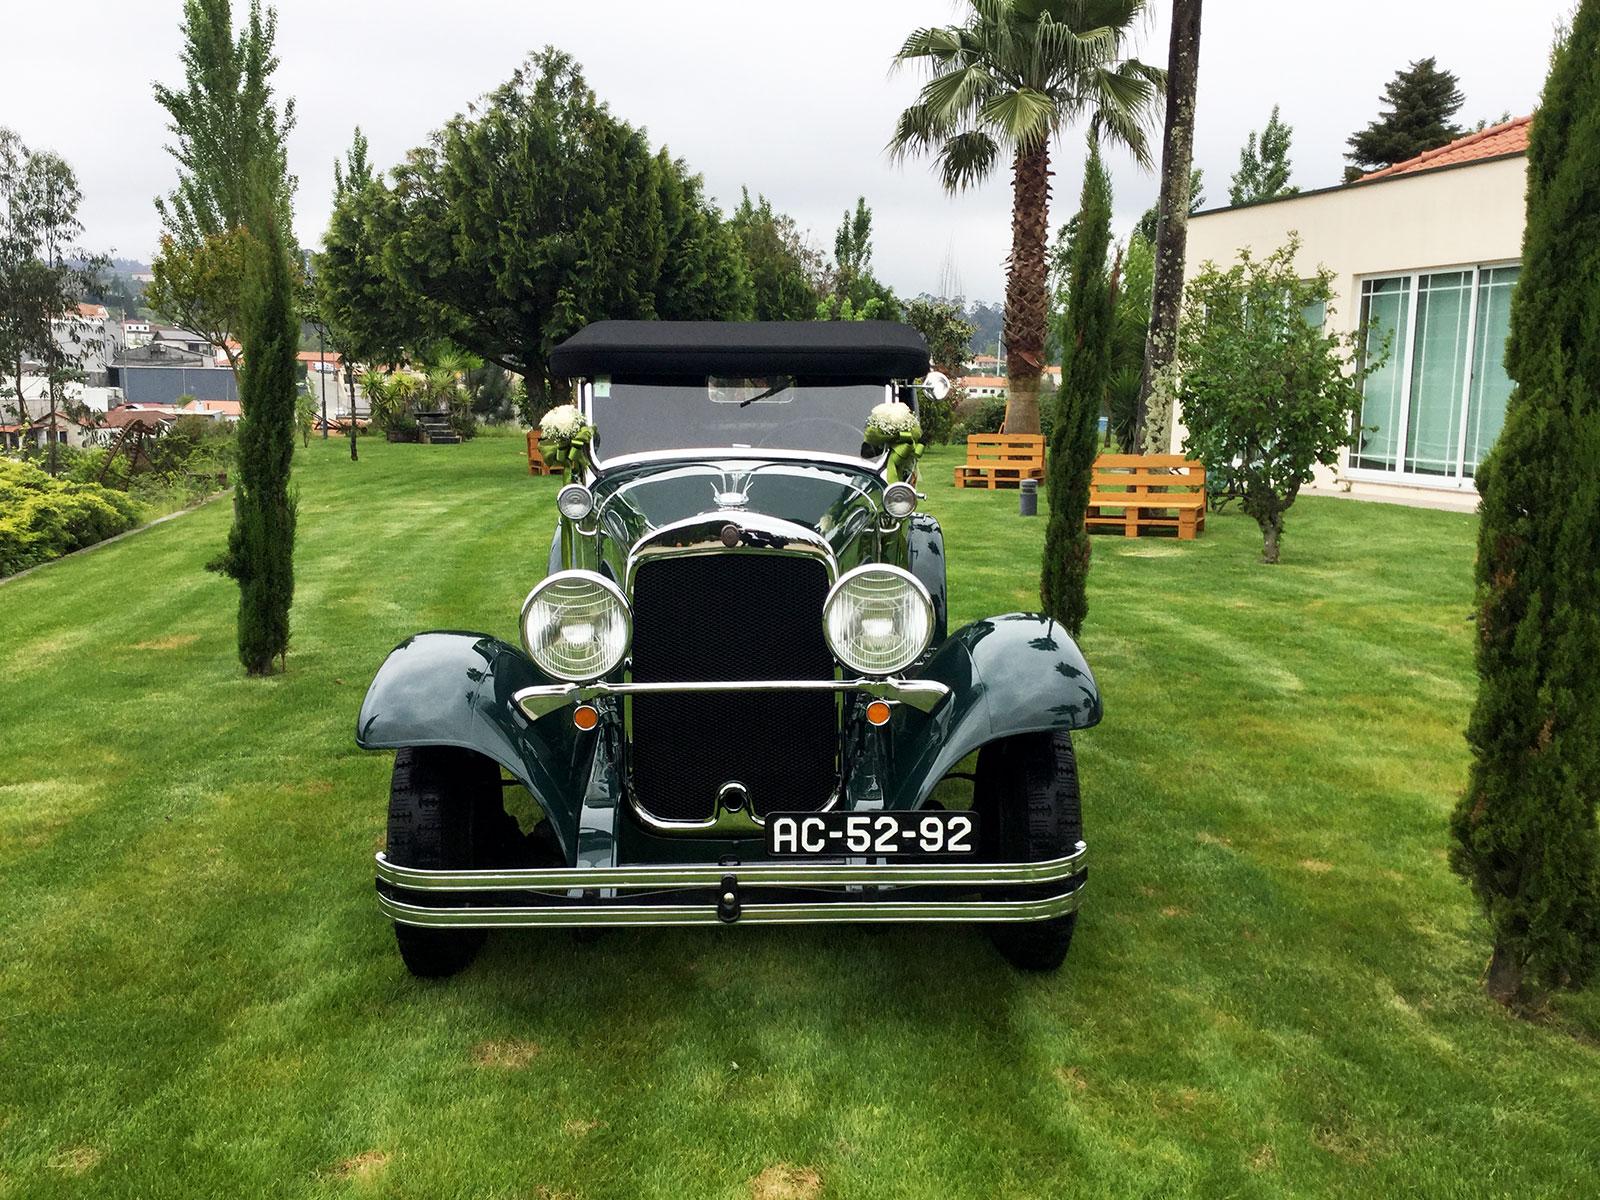 Limoeventos, Limousines, Aluguer de Limousines, Veículos, Classico Chrysler